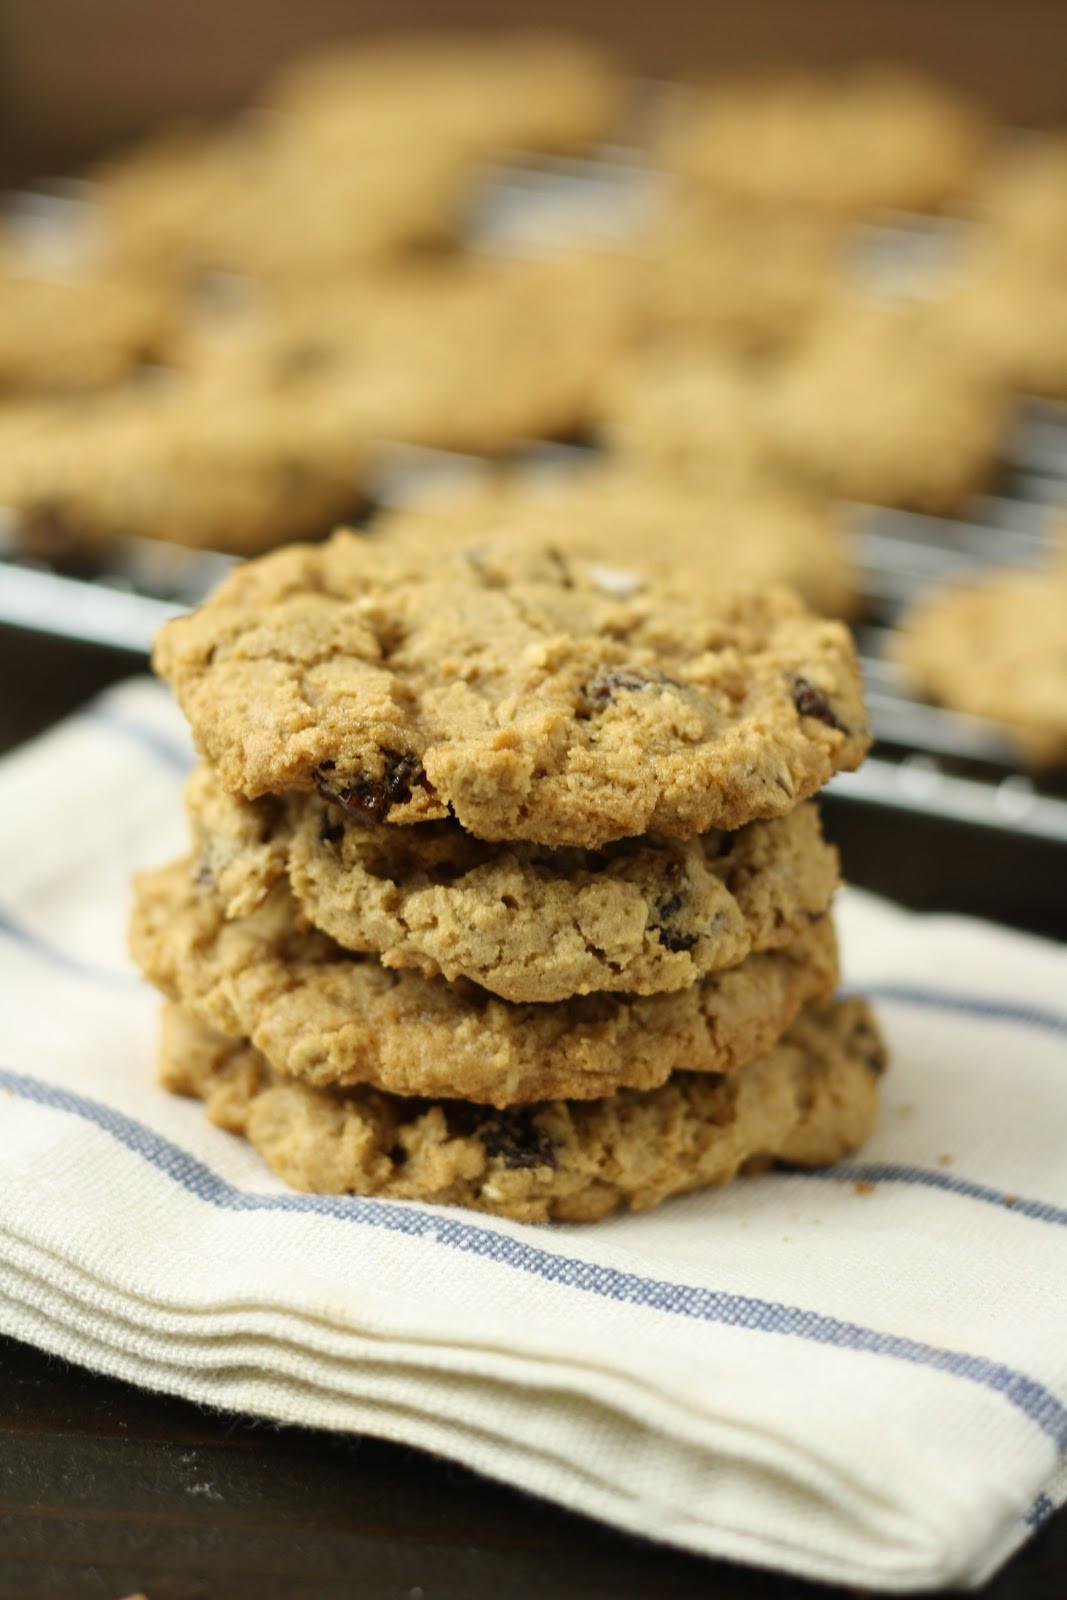 Gluten Free Oatmeal Raisin Cookies  Gluten Free Dessert Recipes for National Oatmeal Cookie